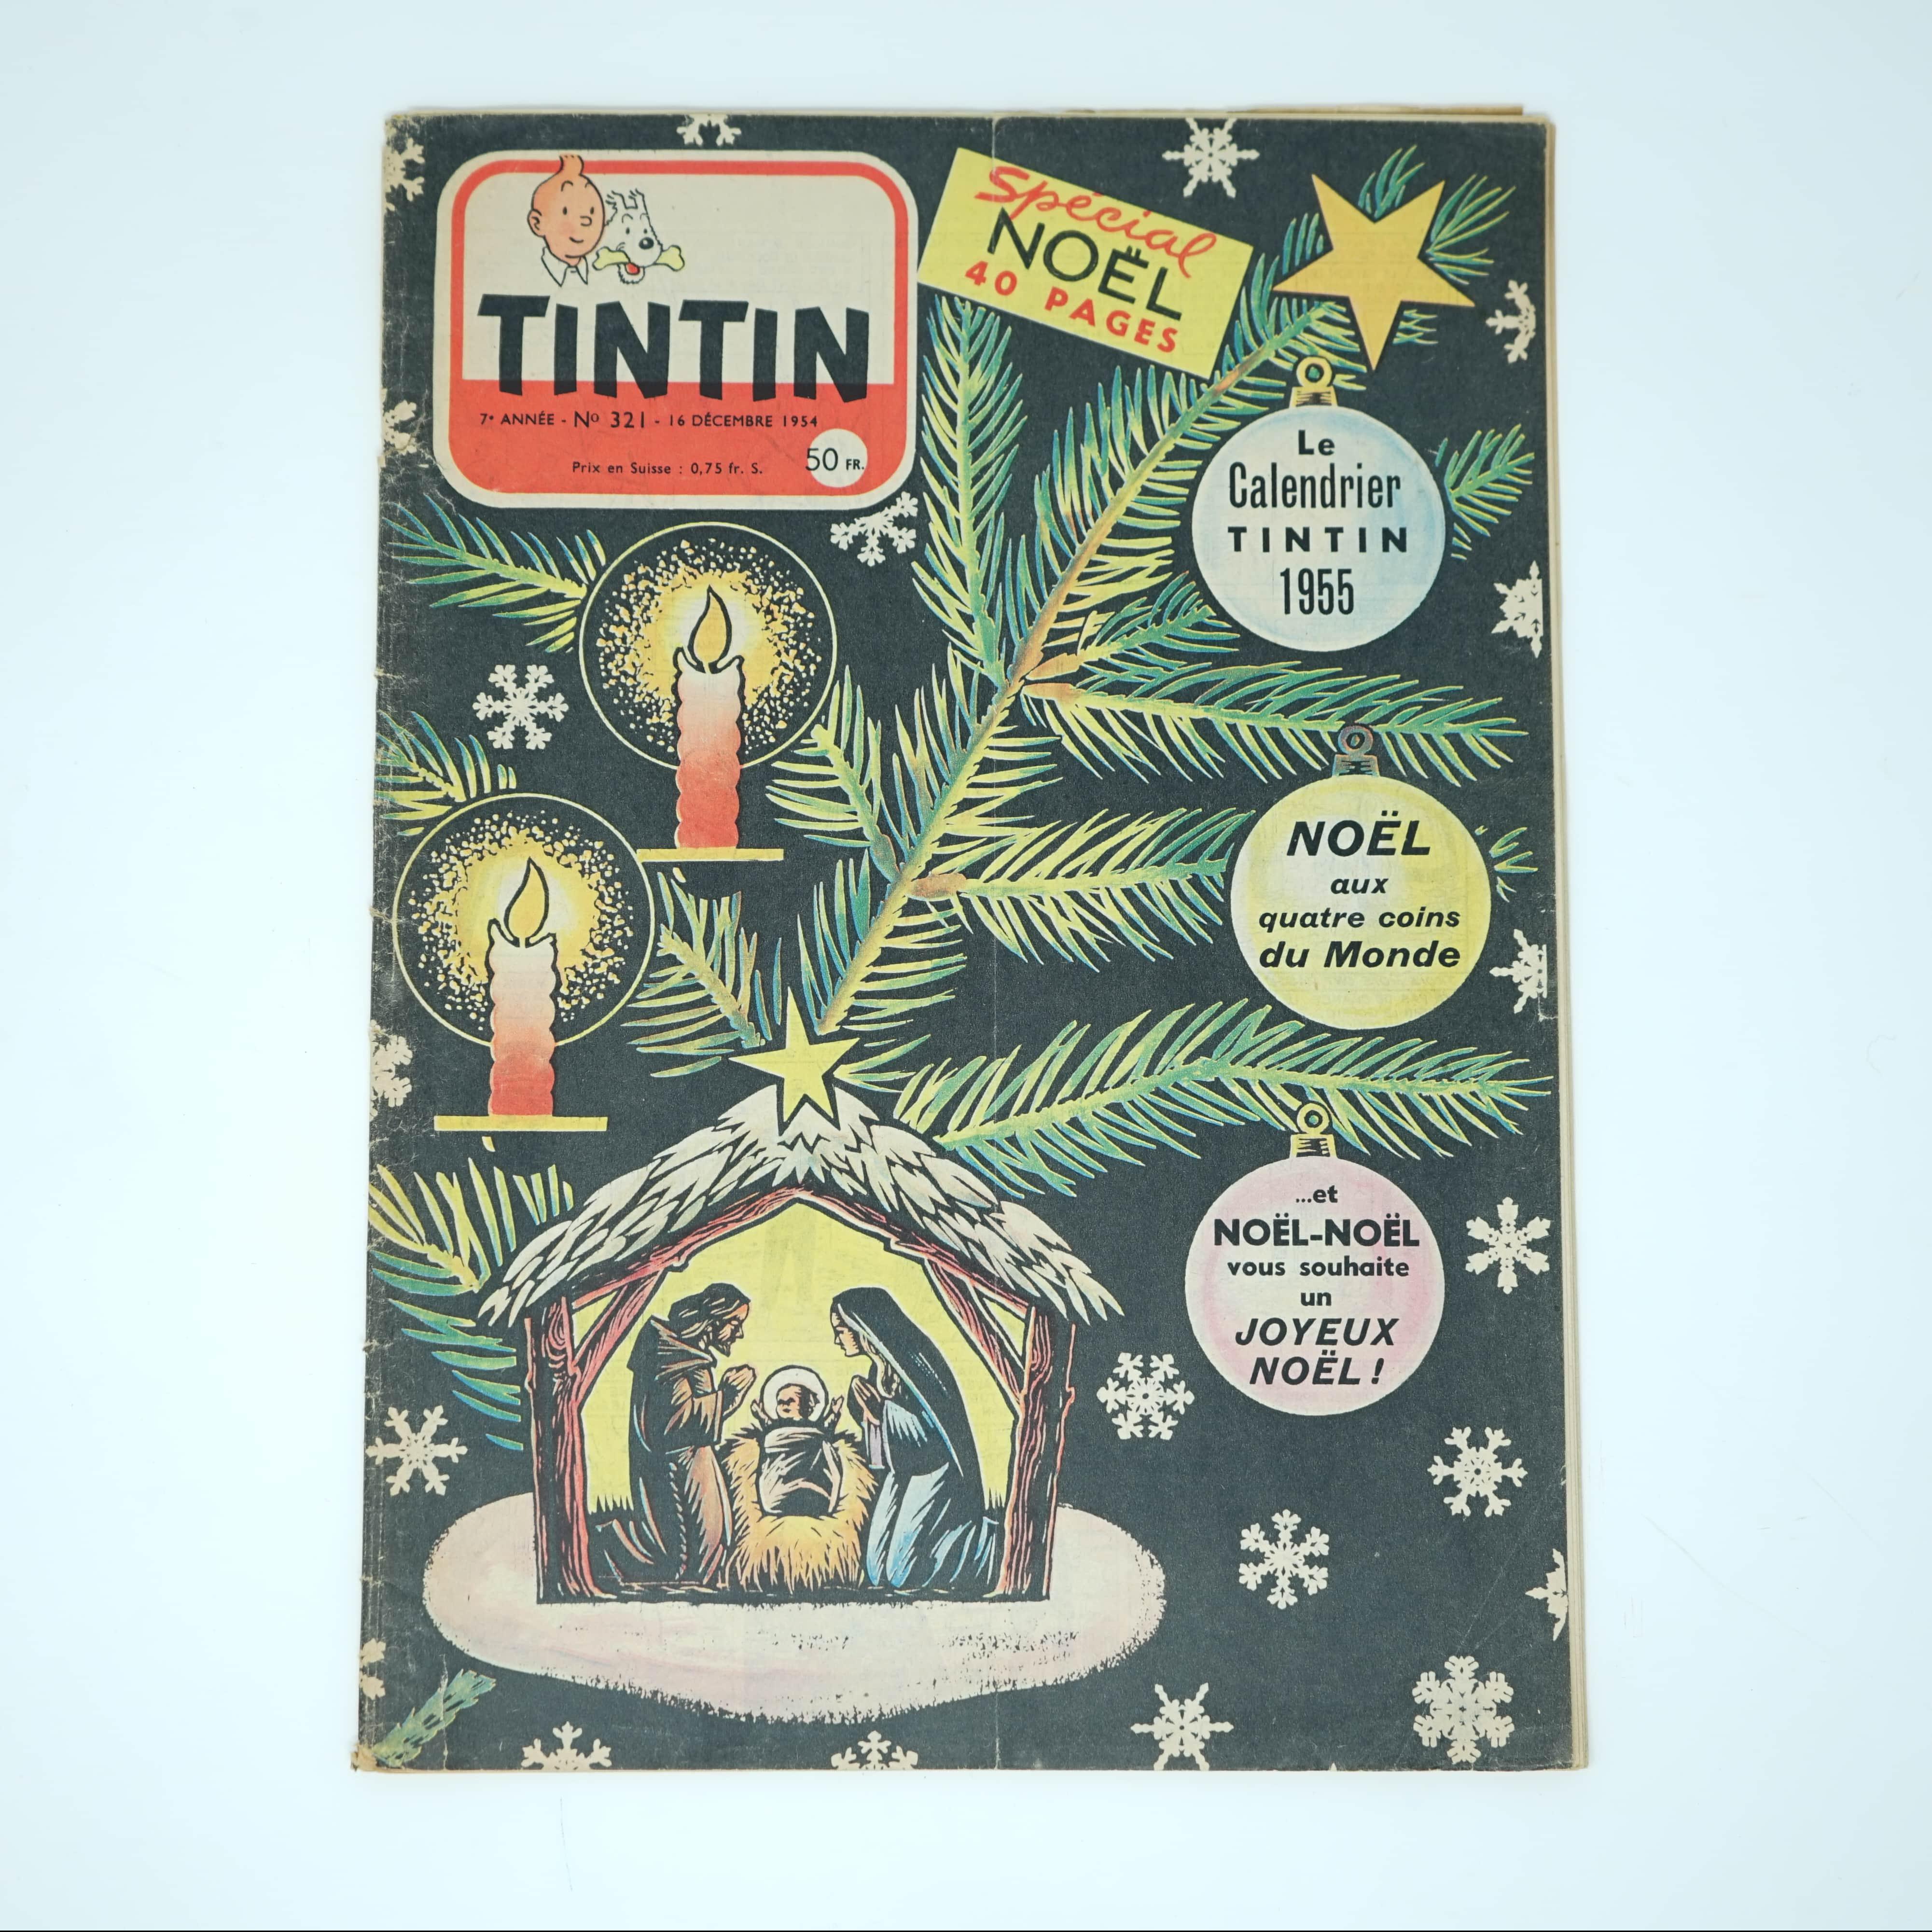 Revue Tintin Spécial Noël 1954